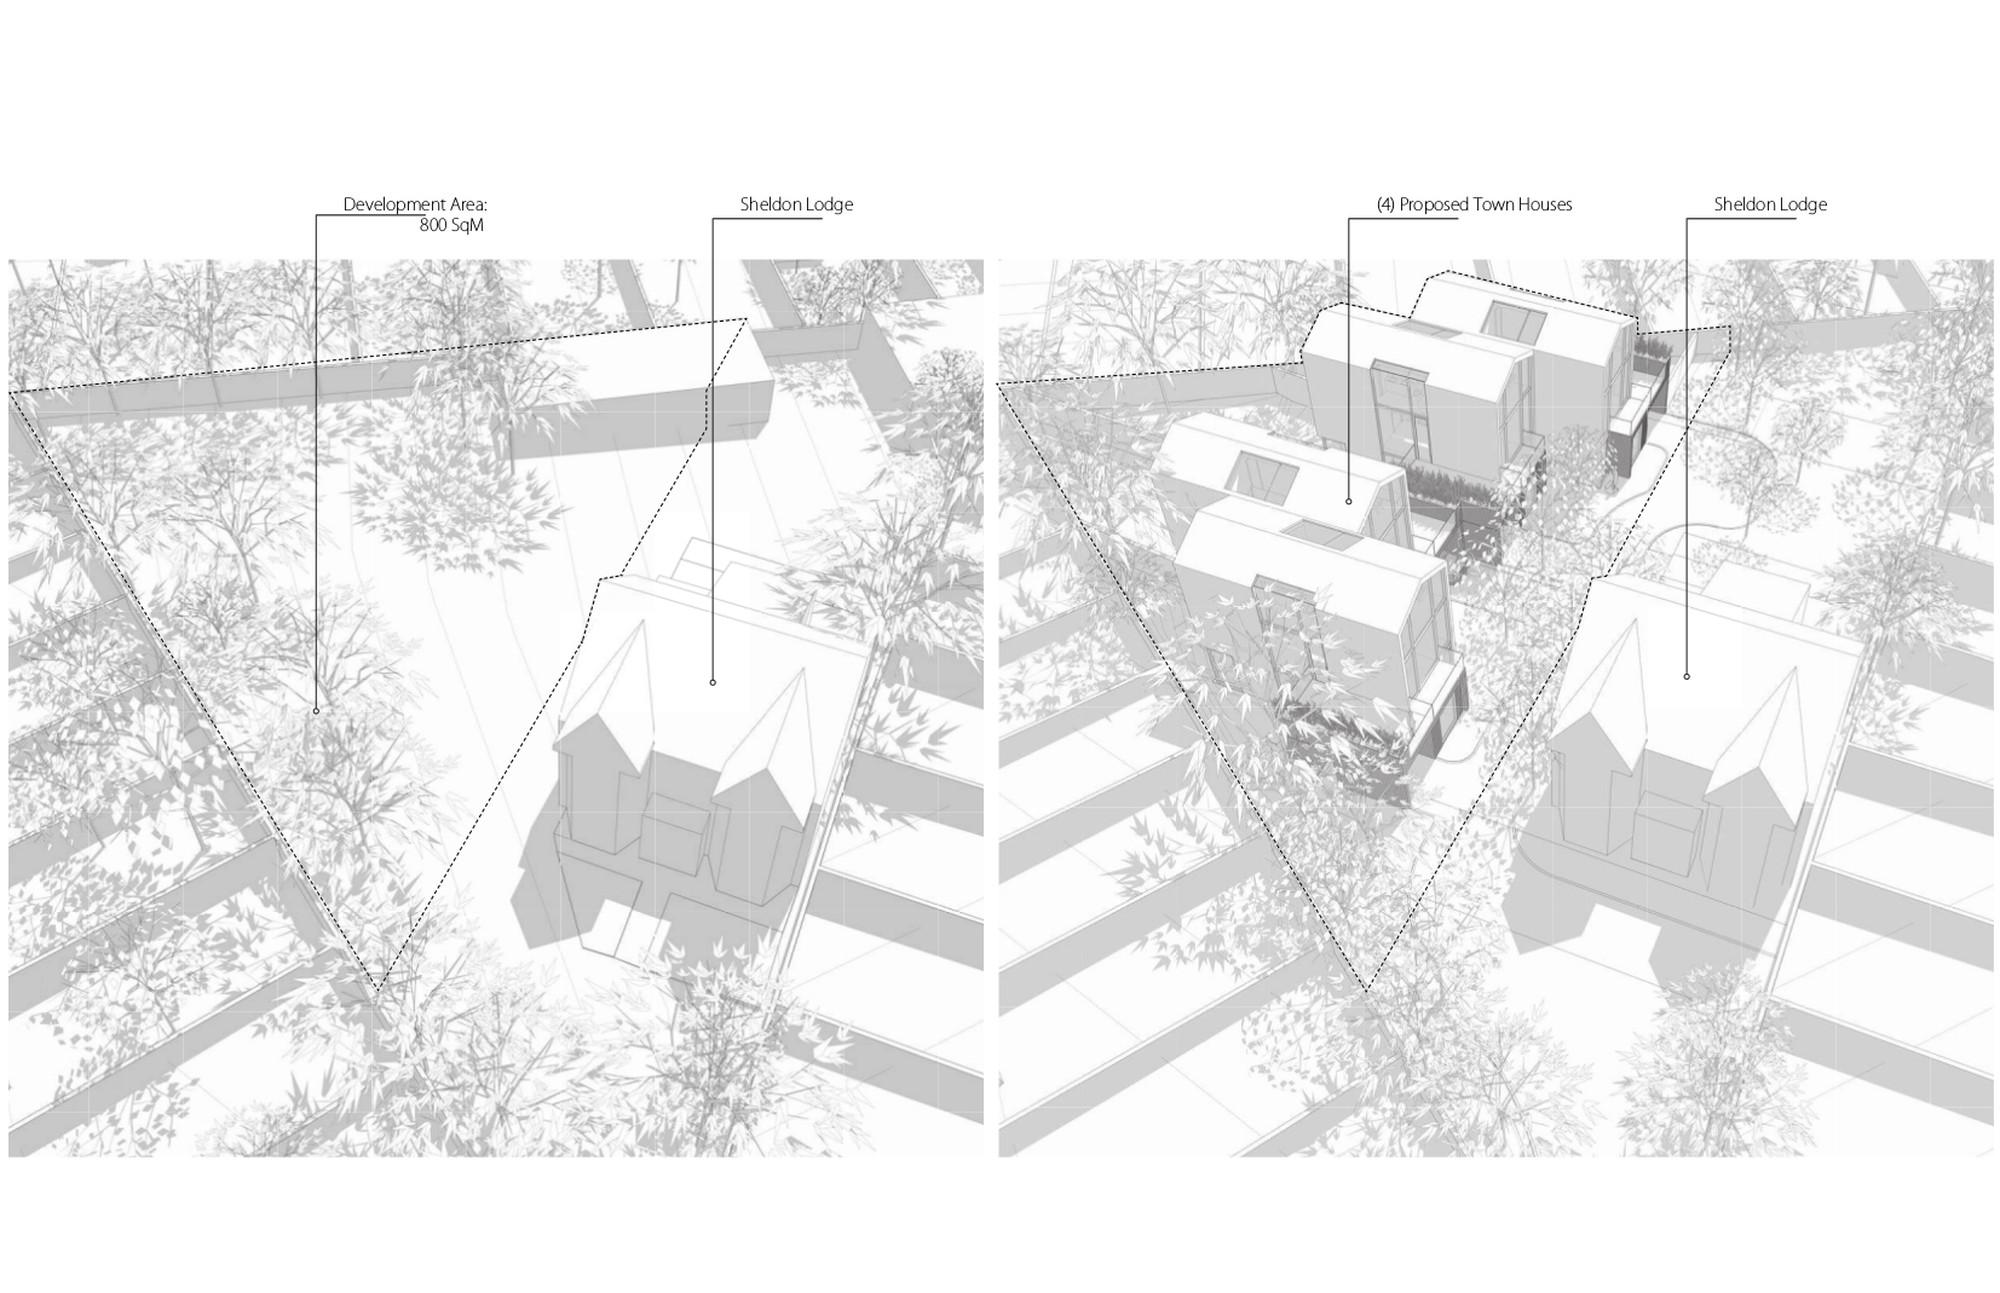 Sheldon Lodge Development Area Site Axo